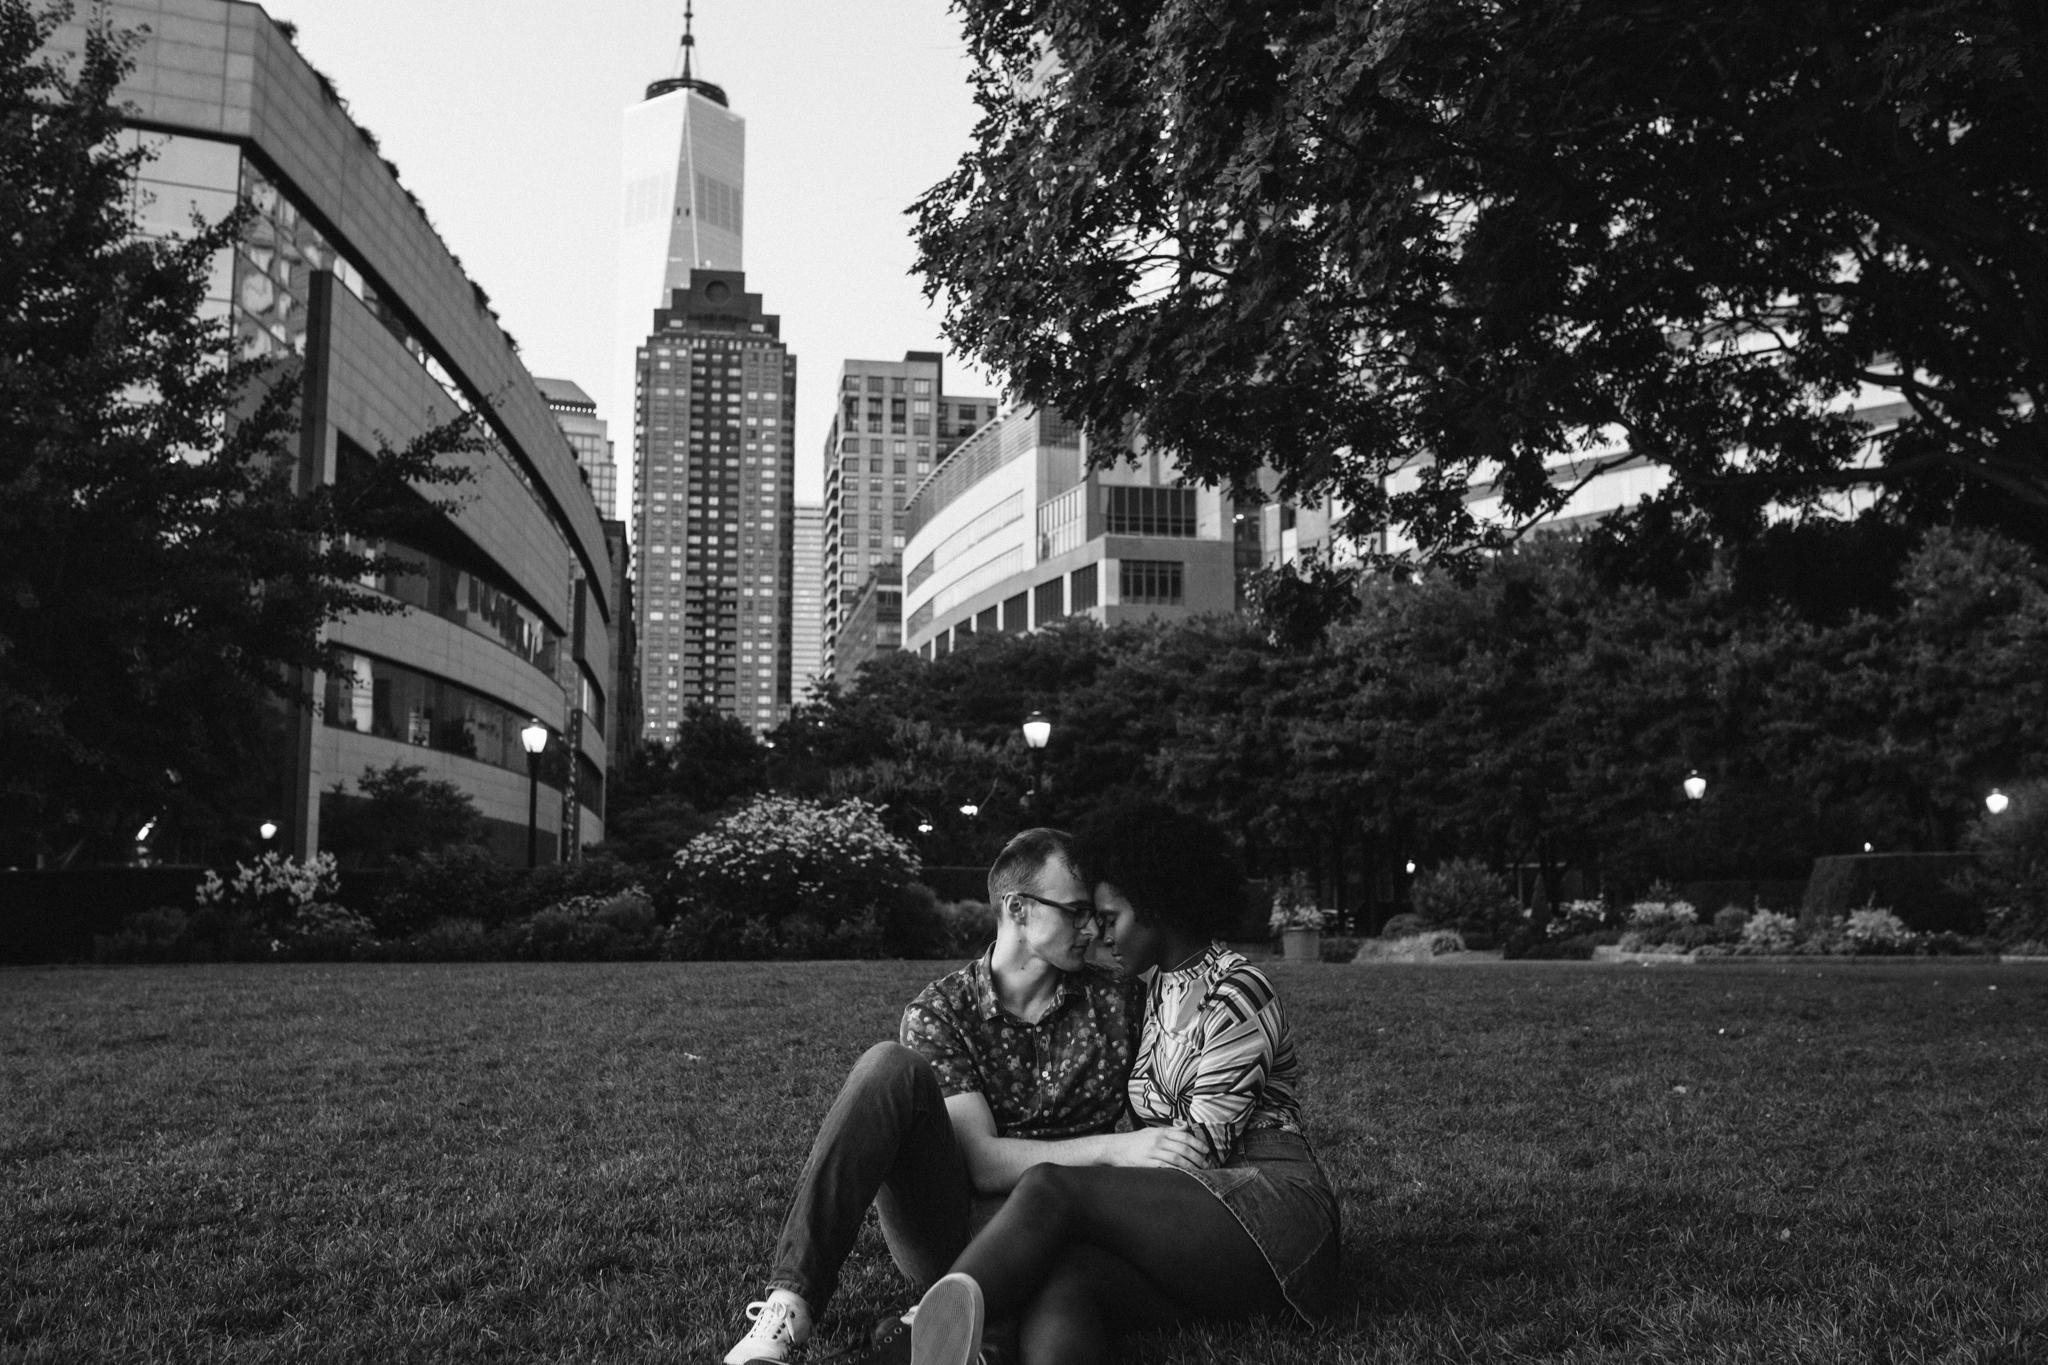 constance_alexander_NYC_engagement_south_cove_park_Nycweddingphotographer-126.jpg